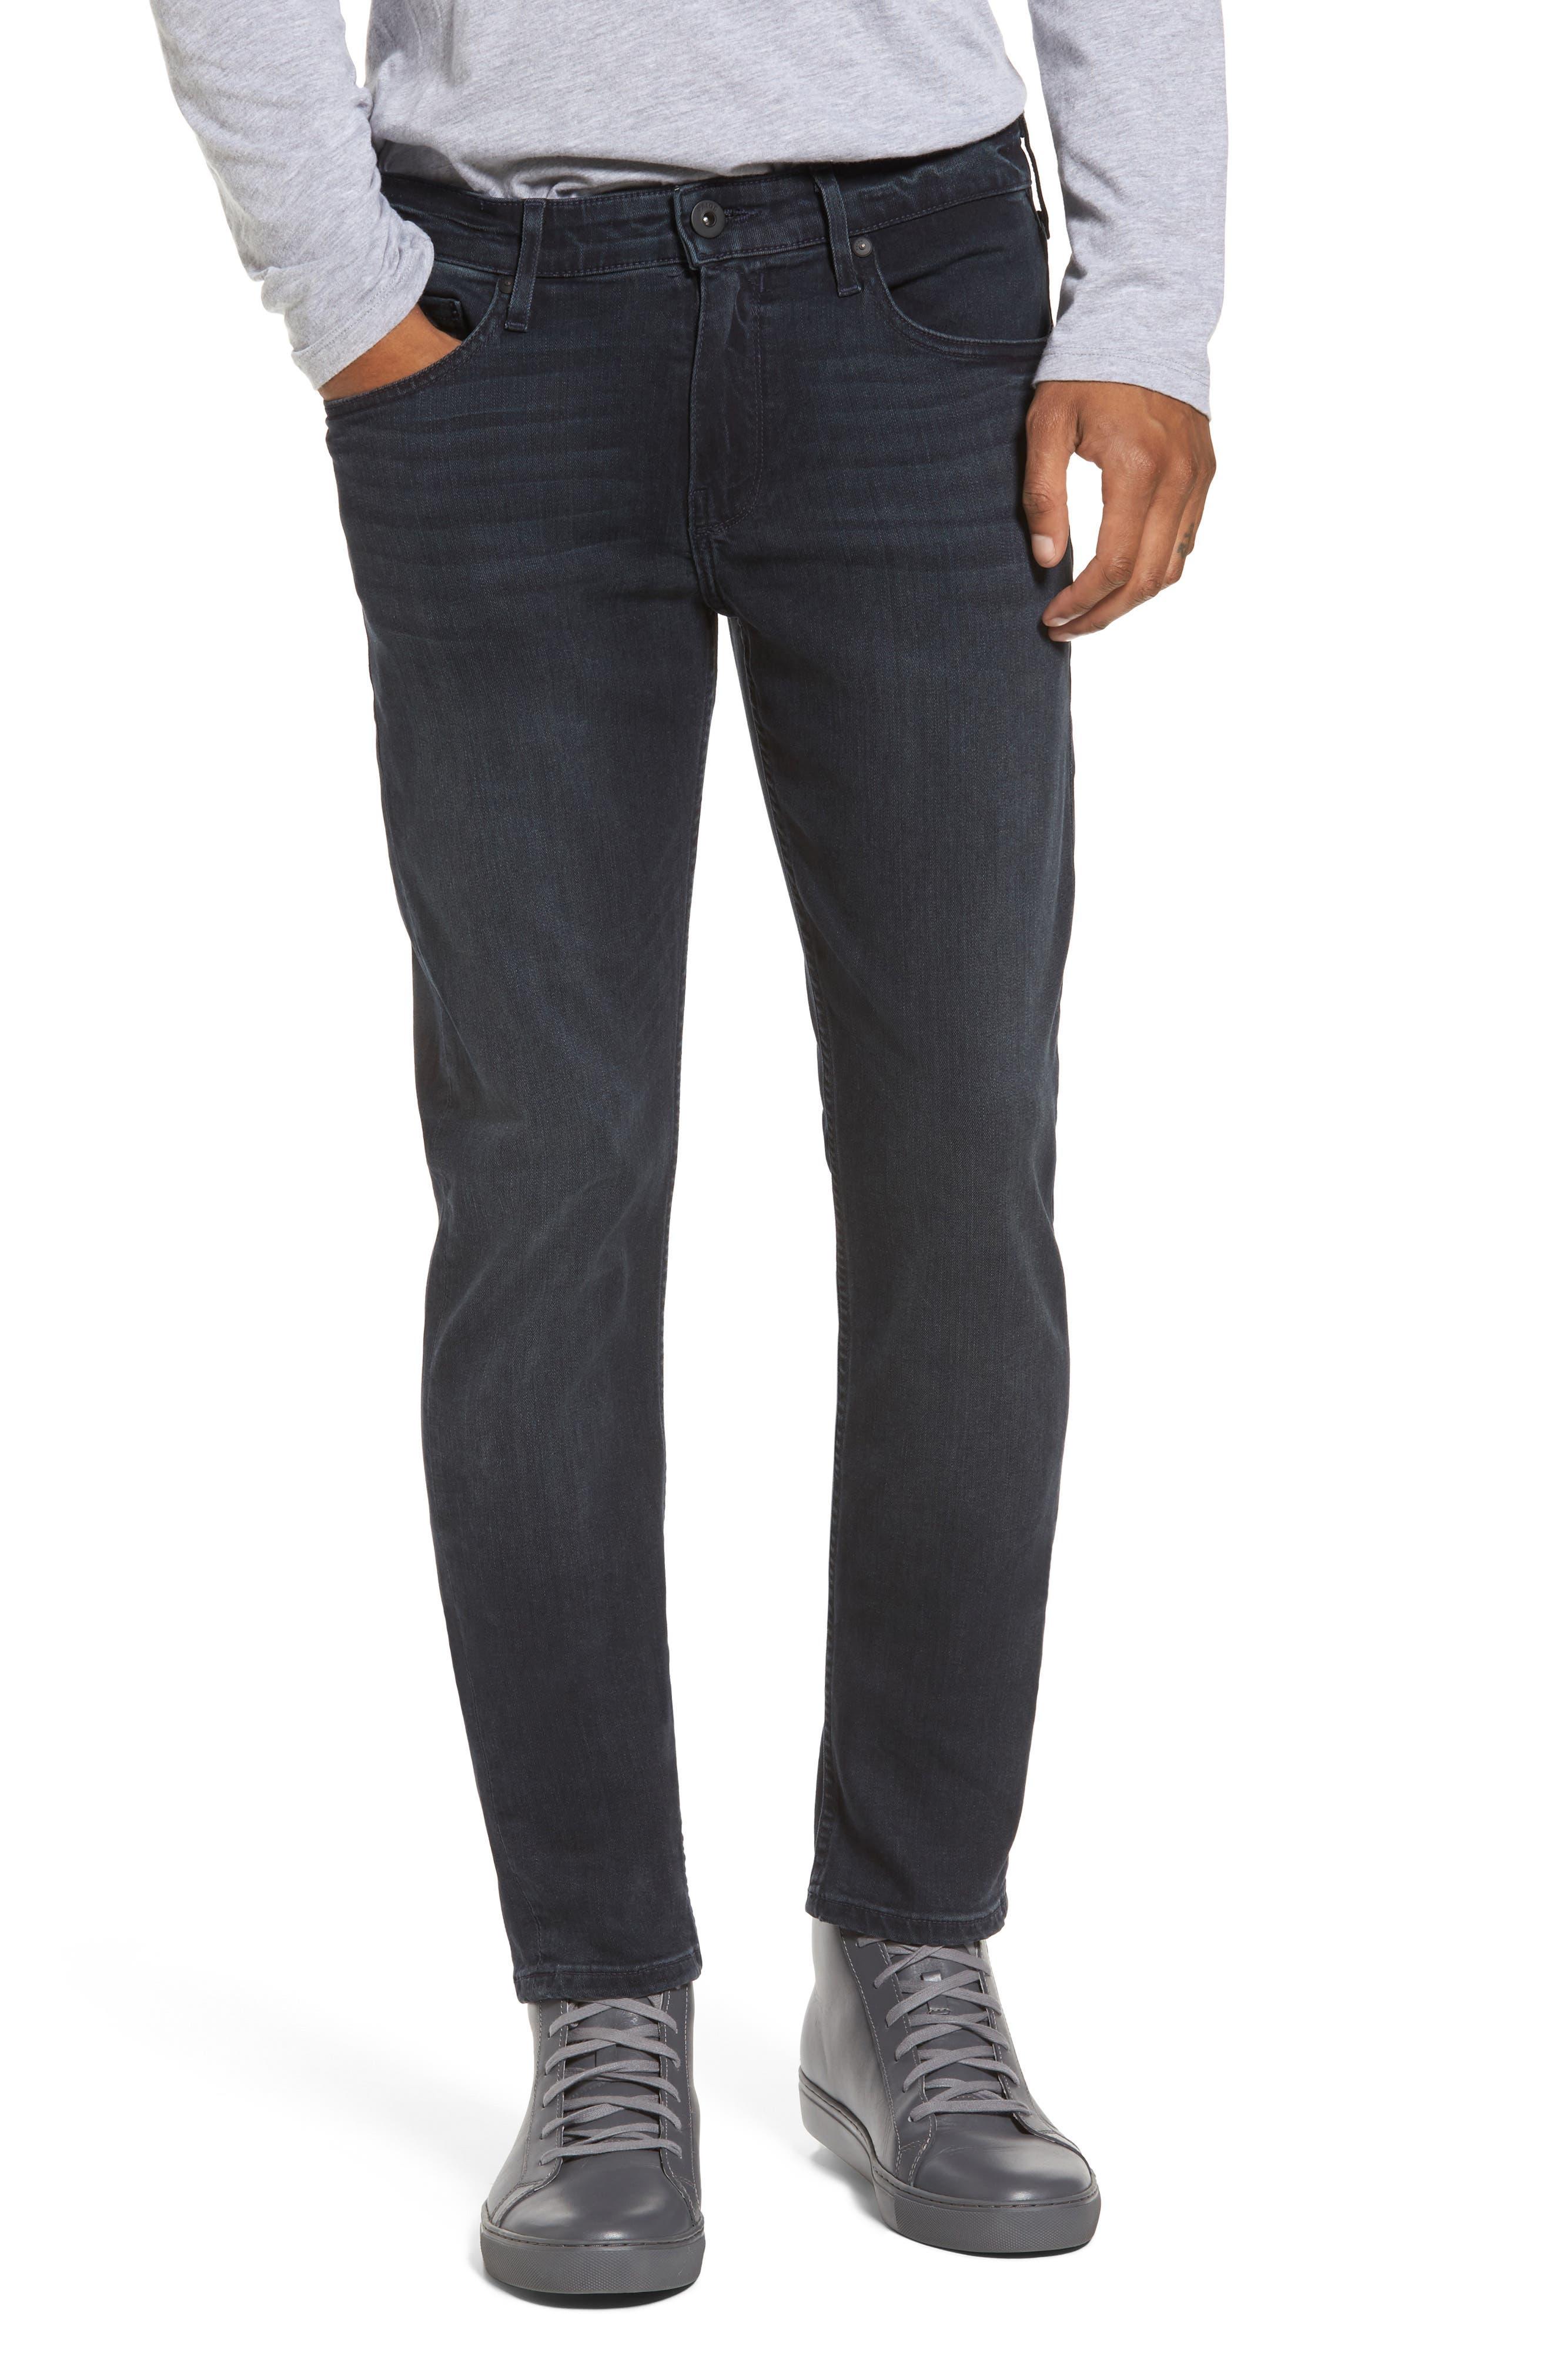 Main Image - PAIGE Transcend - Croft Skinny Fit Jeans (Beckett)